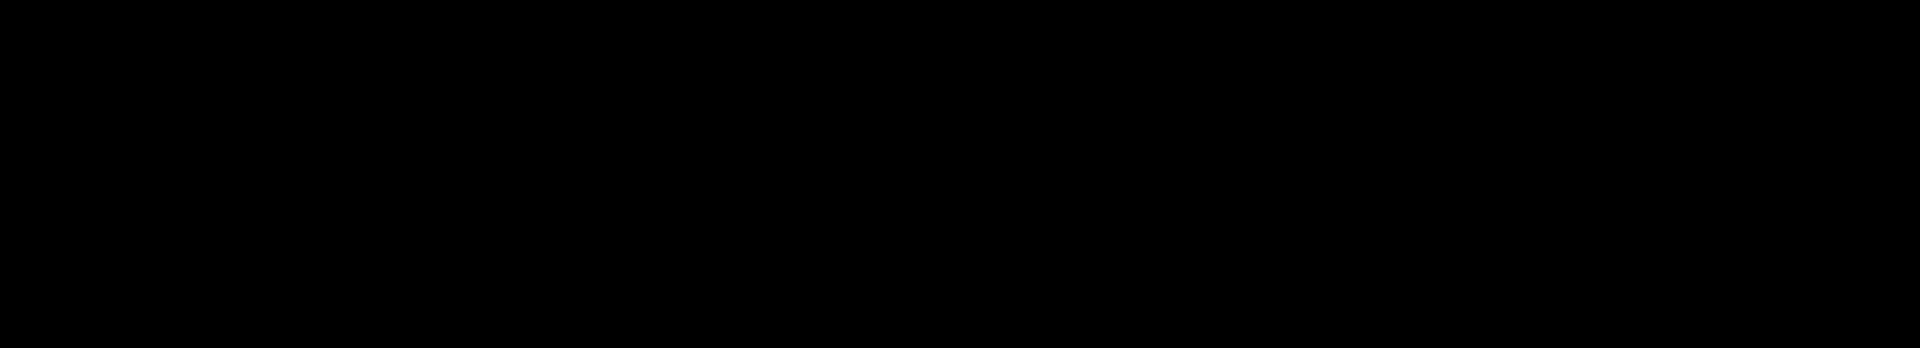 Image-PNG-Transparent-Exact-Large.png